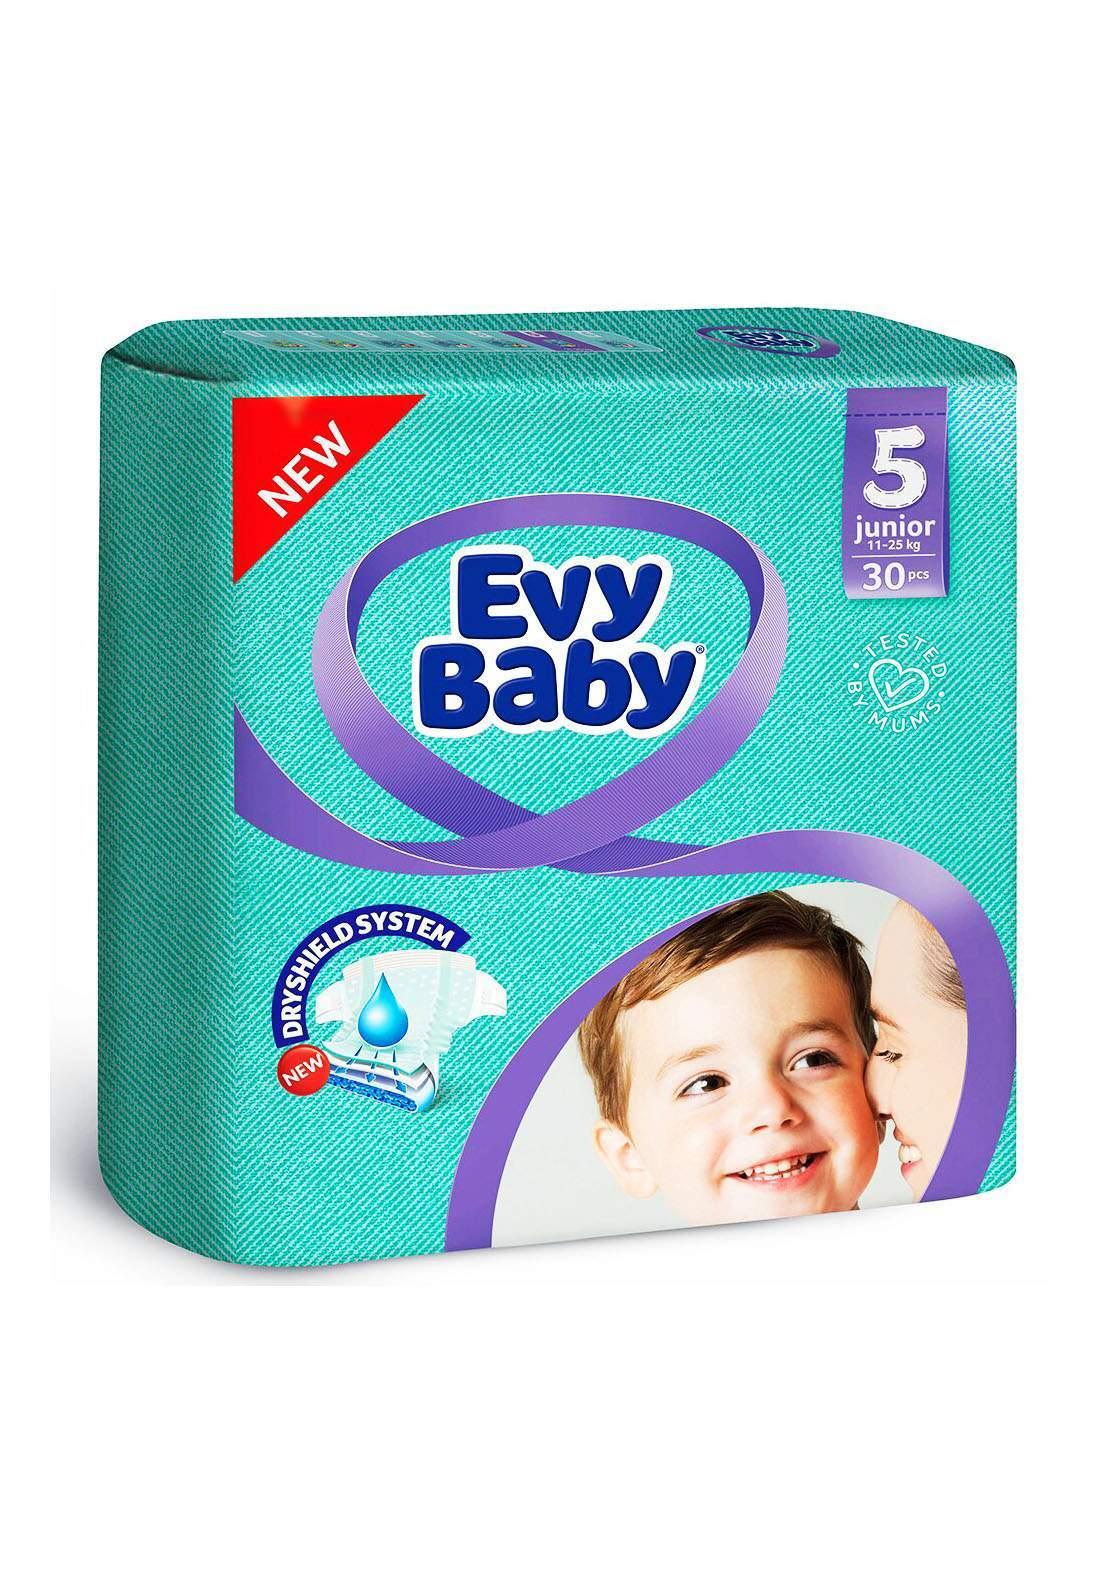 Evy Baby Diapers 5 Junior 11-25 Kg 30 Pcs 5 حفاضات ايفي بيبي للاطفال عادي رقم